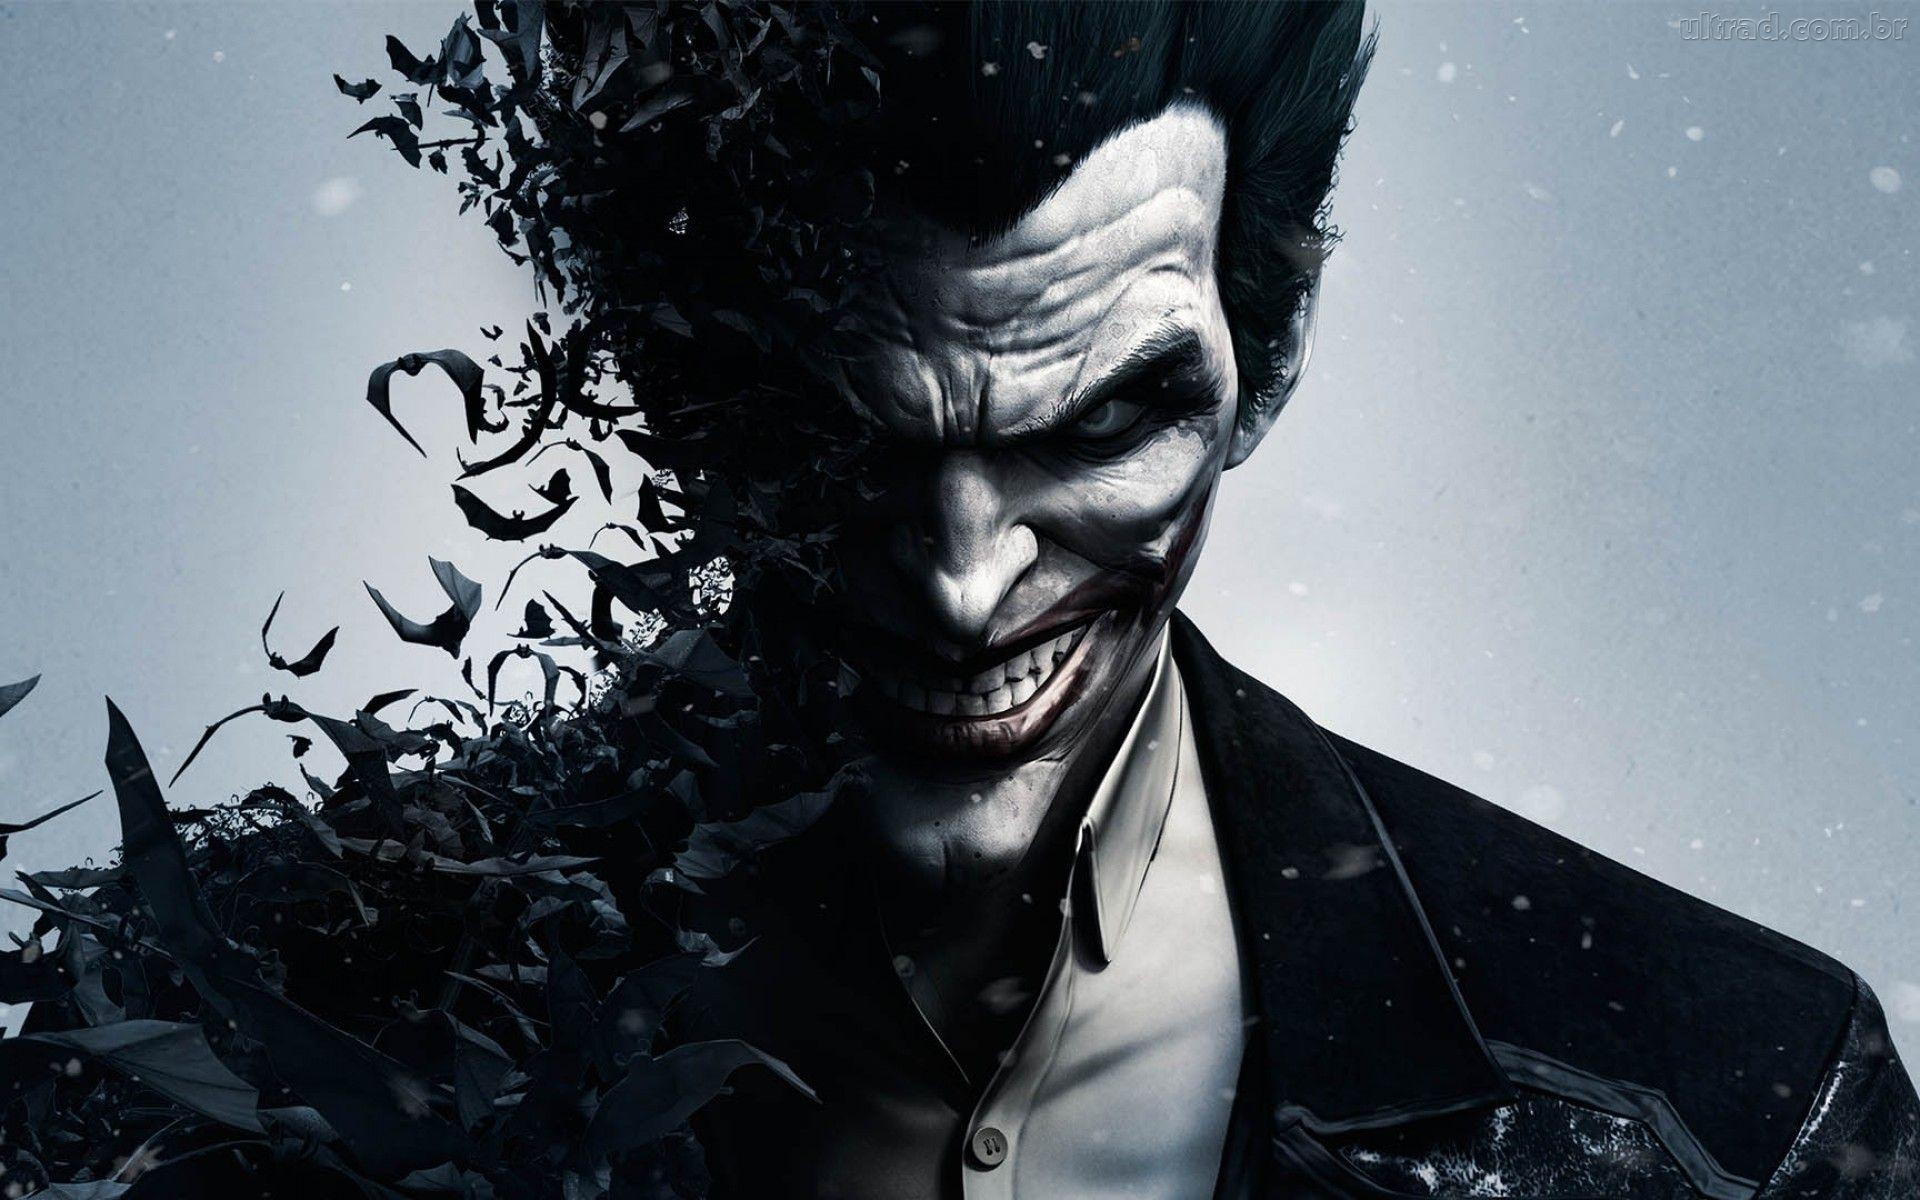 The Joker Smiling Batman Arkham Origins 1920×1080 Game Wallpaper